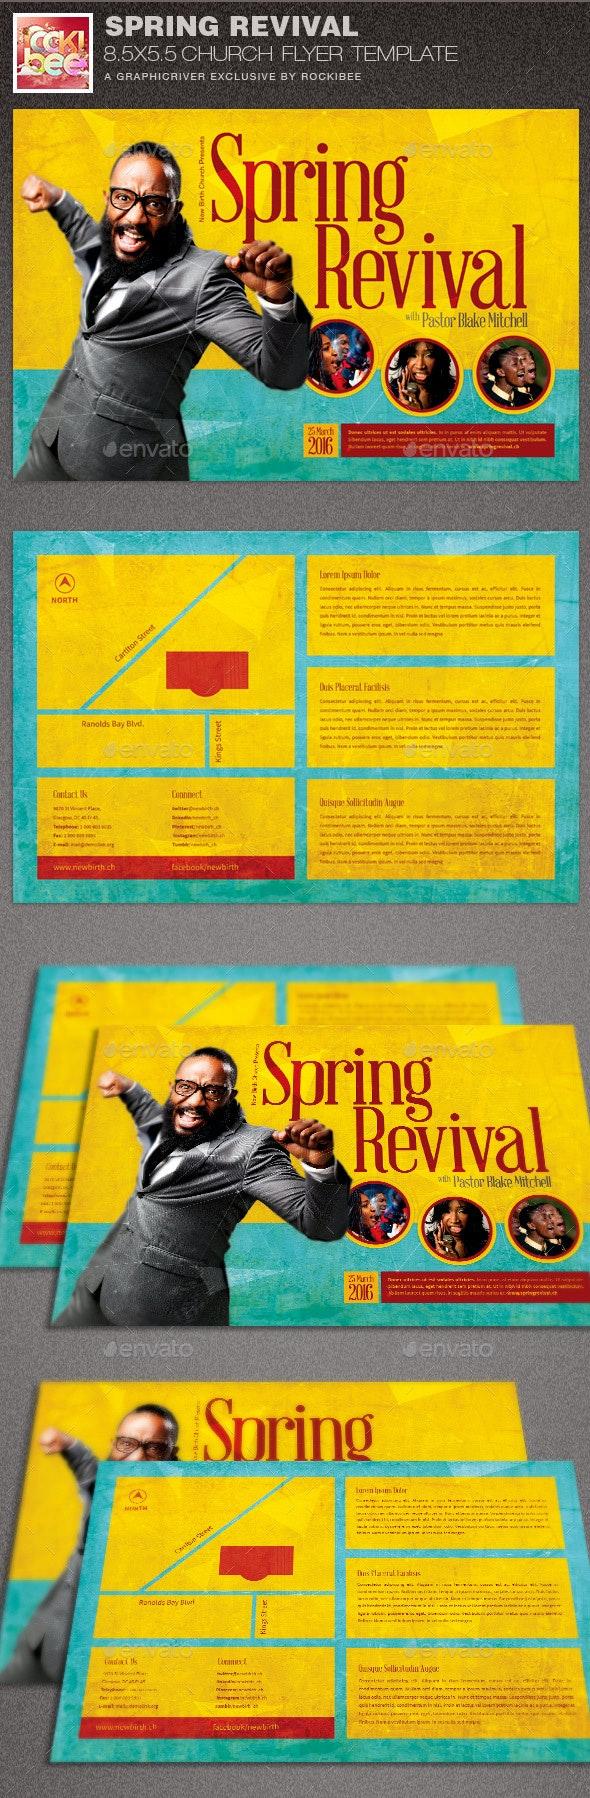 Spring Revival Church Flyer Template - Church Flyers